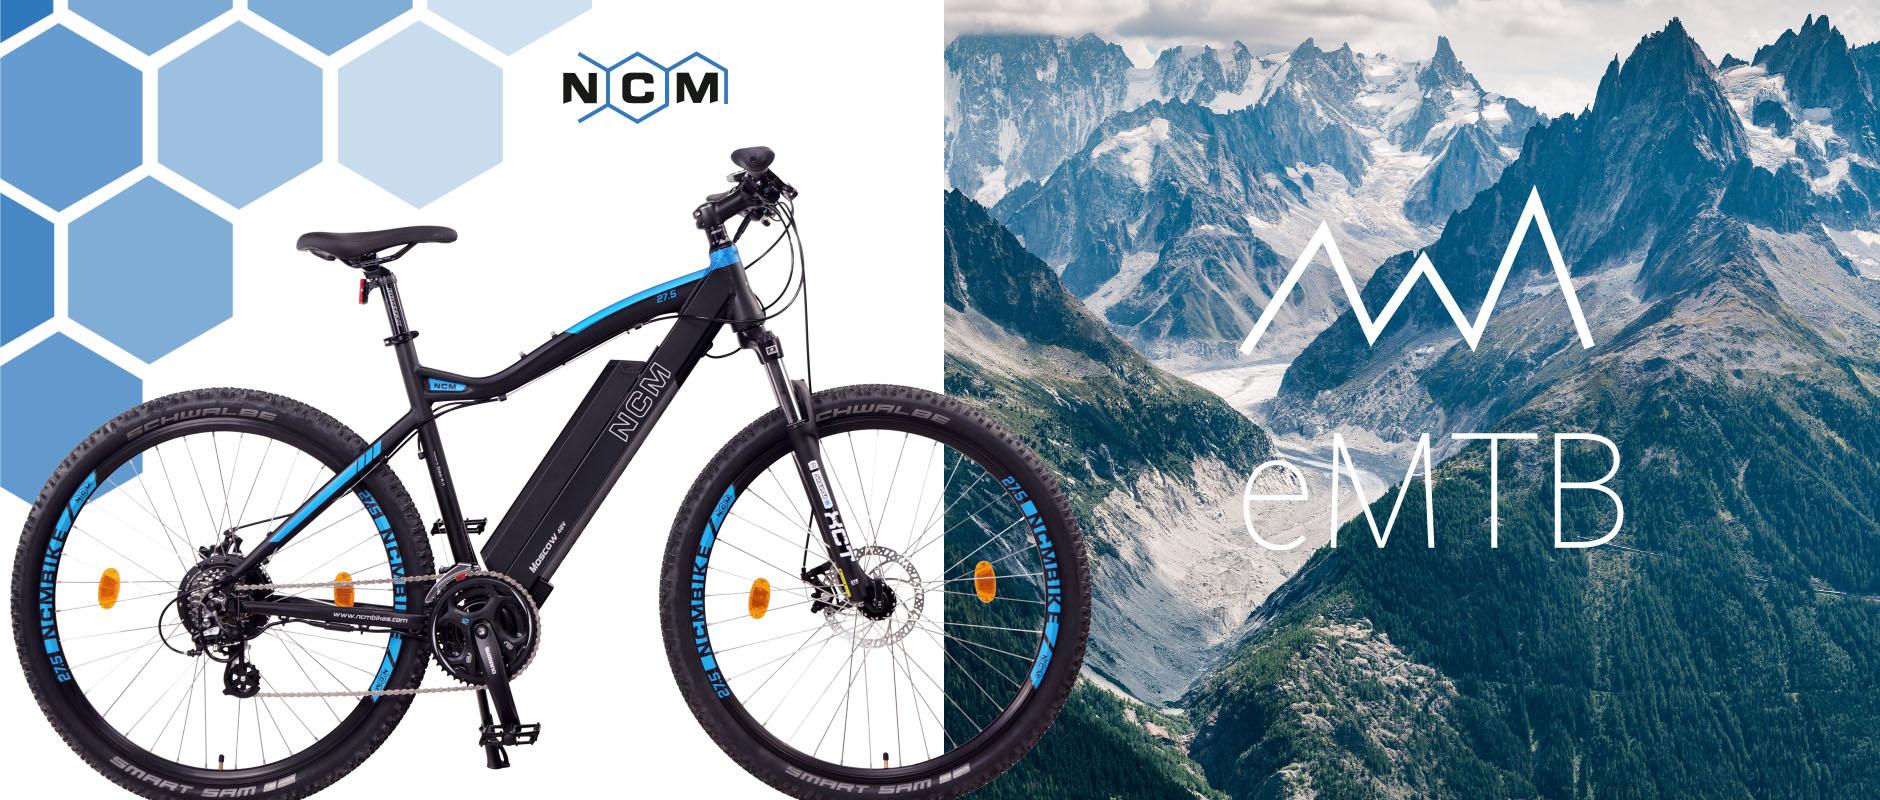 ncm moscow 48v 27 5 29 e mtb mountainbike e bike. Black Bedroom Furniture Sets. Home Design Ideas